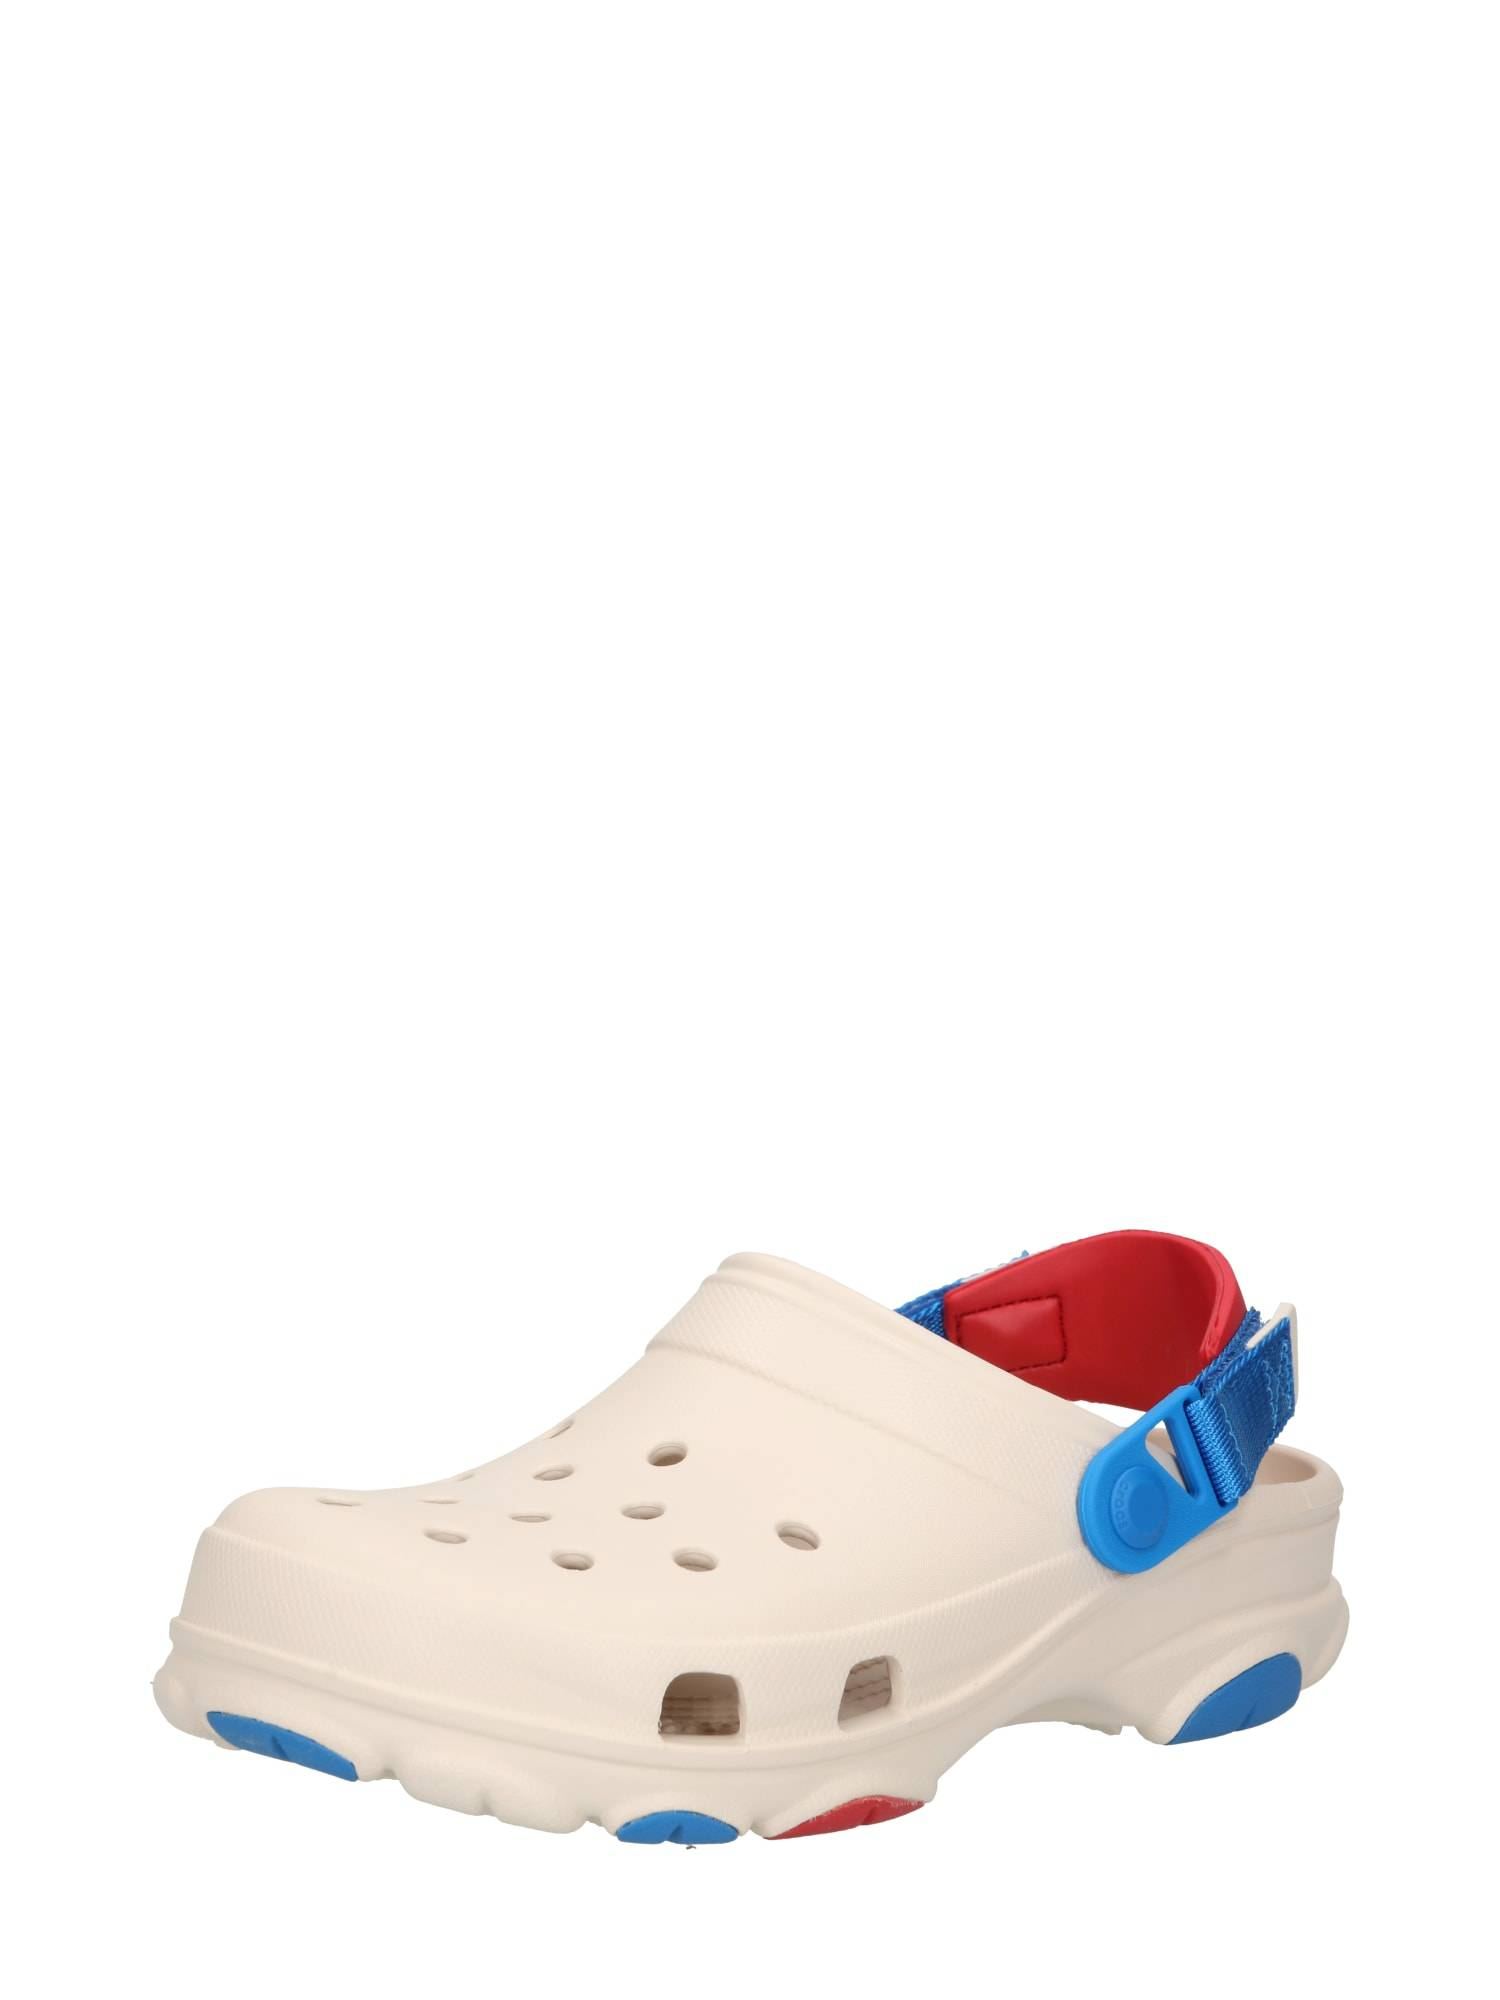 Crocs Sabots  - Beige - Taille: M11 - male